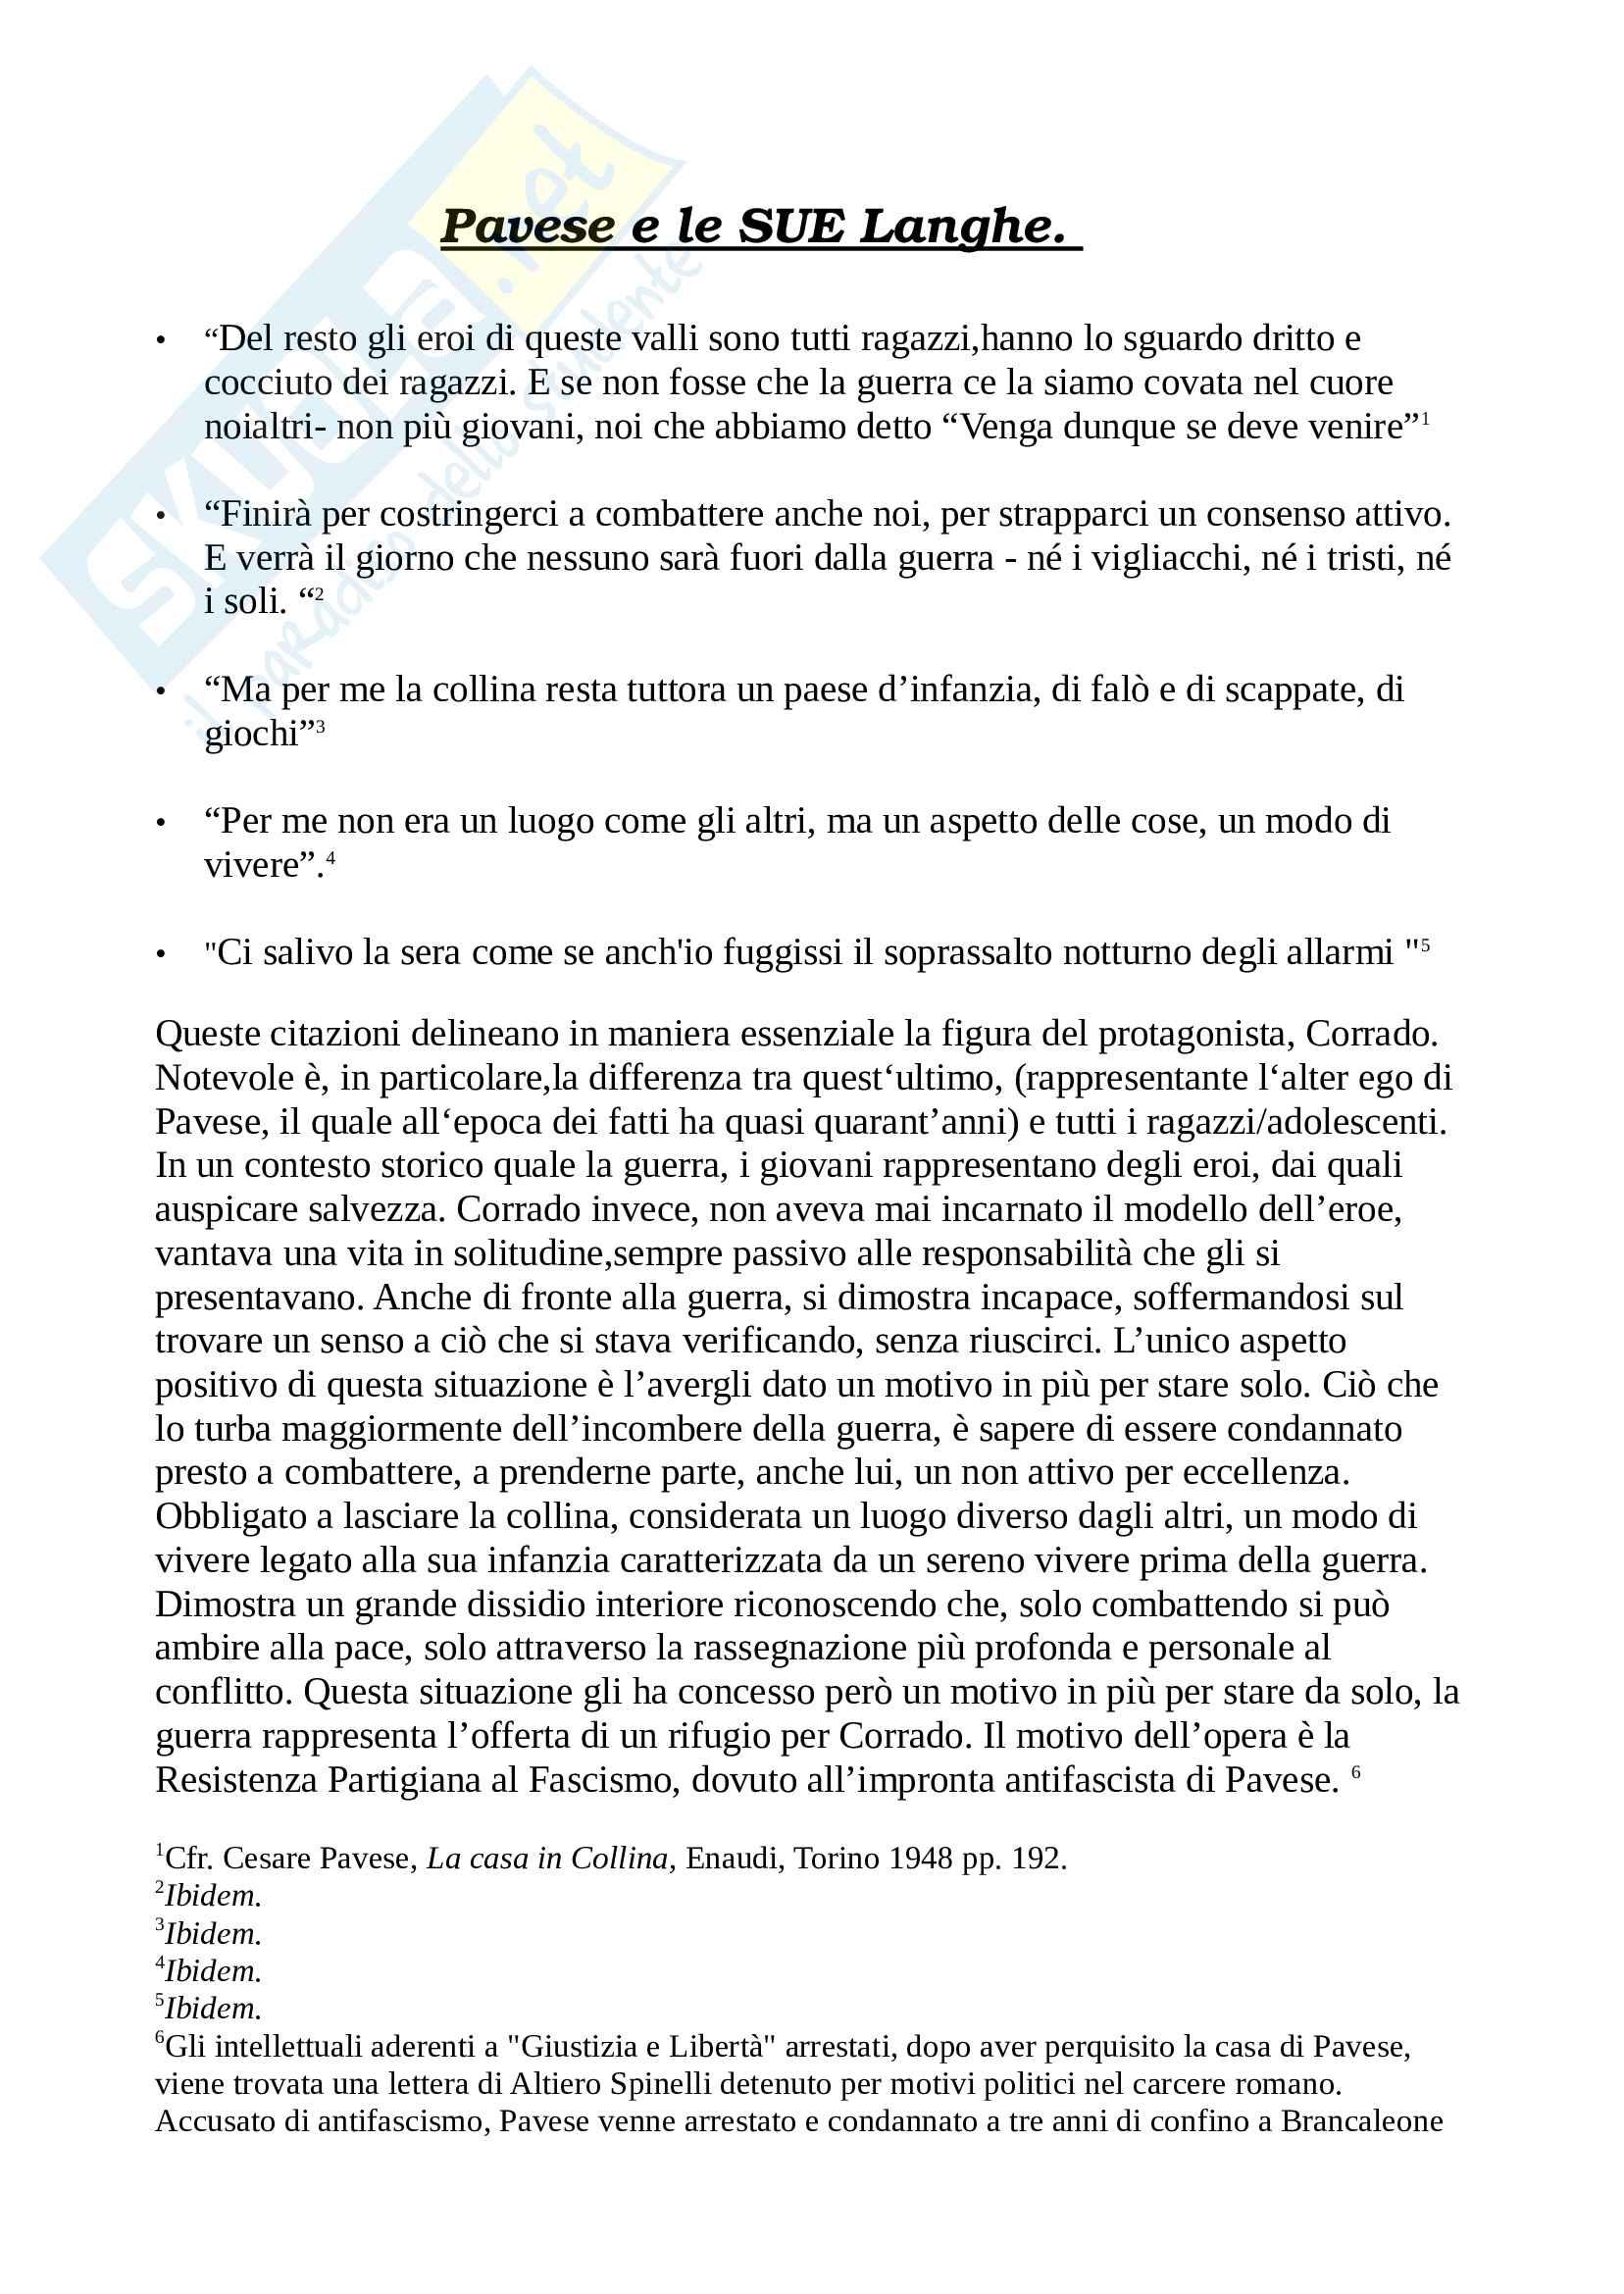 Tesina Cesare Pavese: La casa in collina. Letteratura Italiana - Fabio Pierangeli